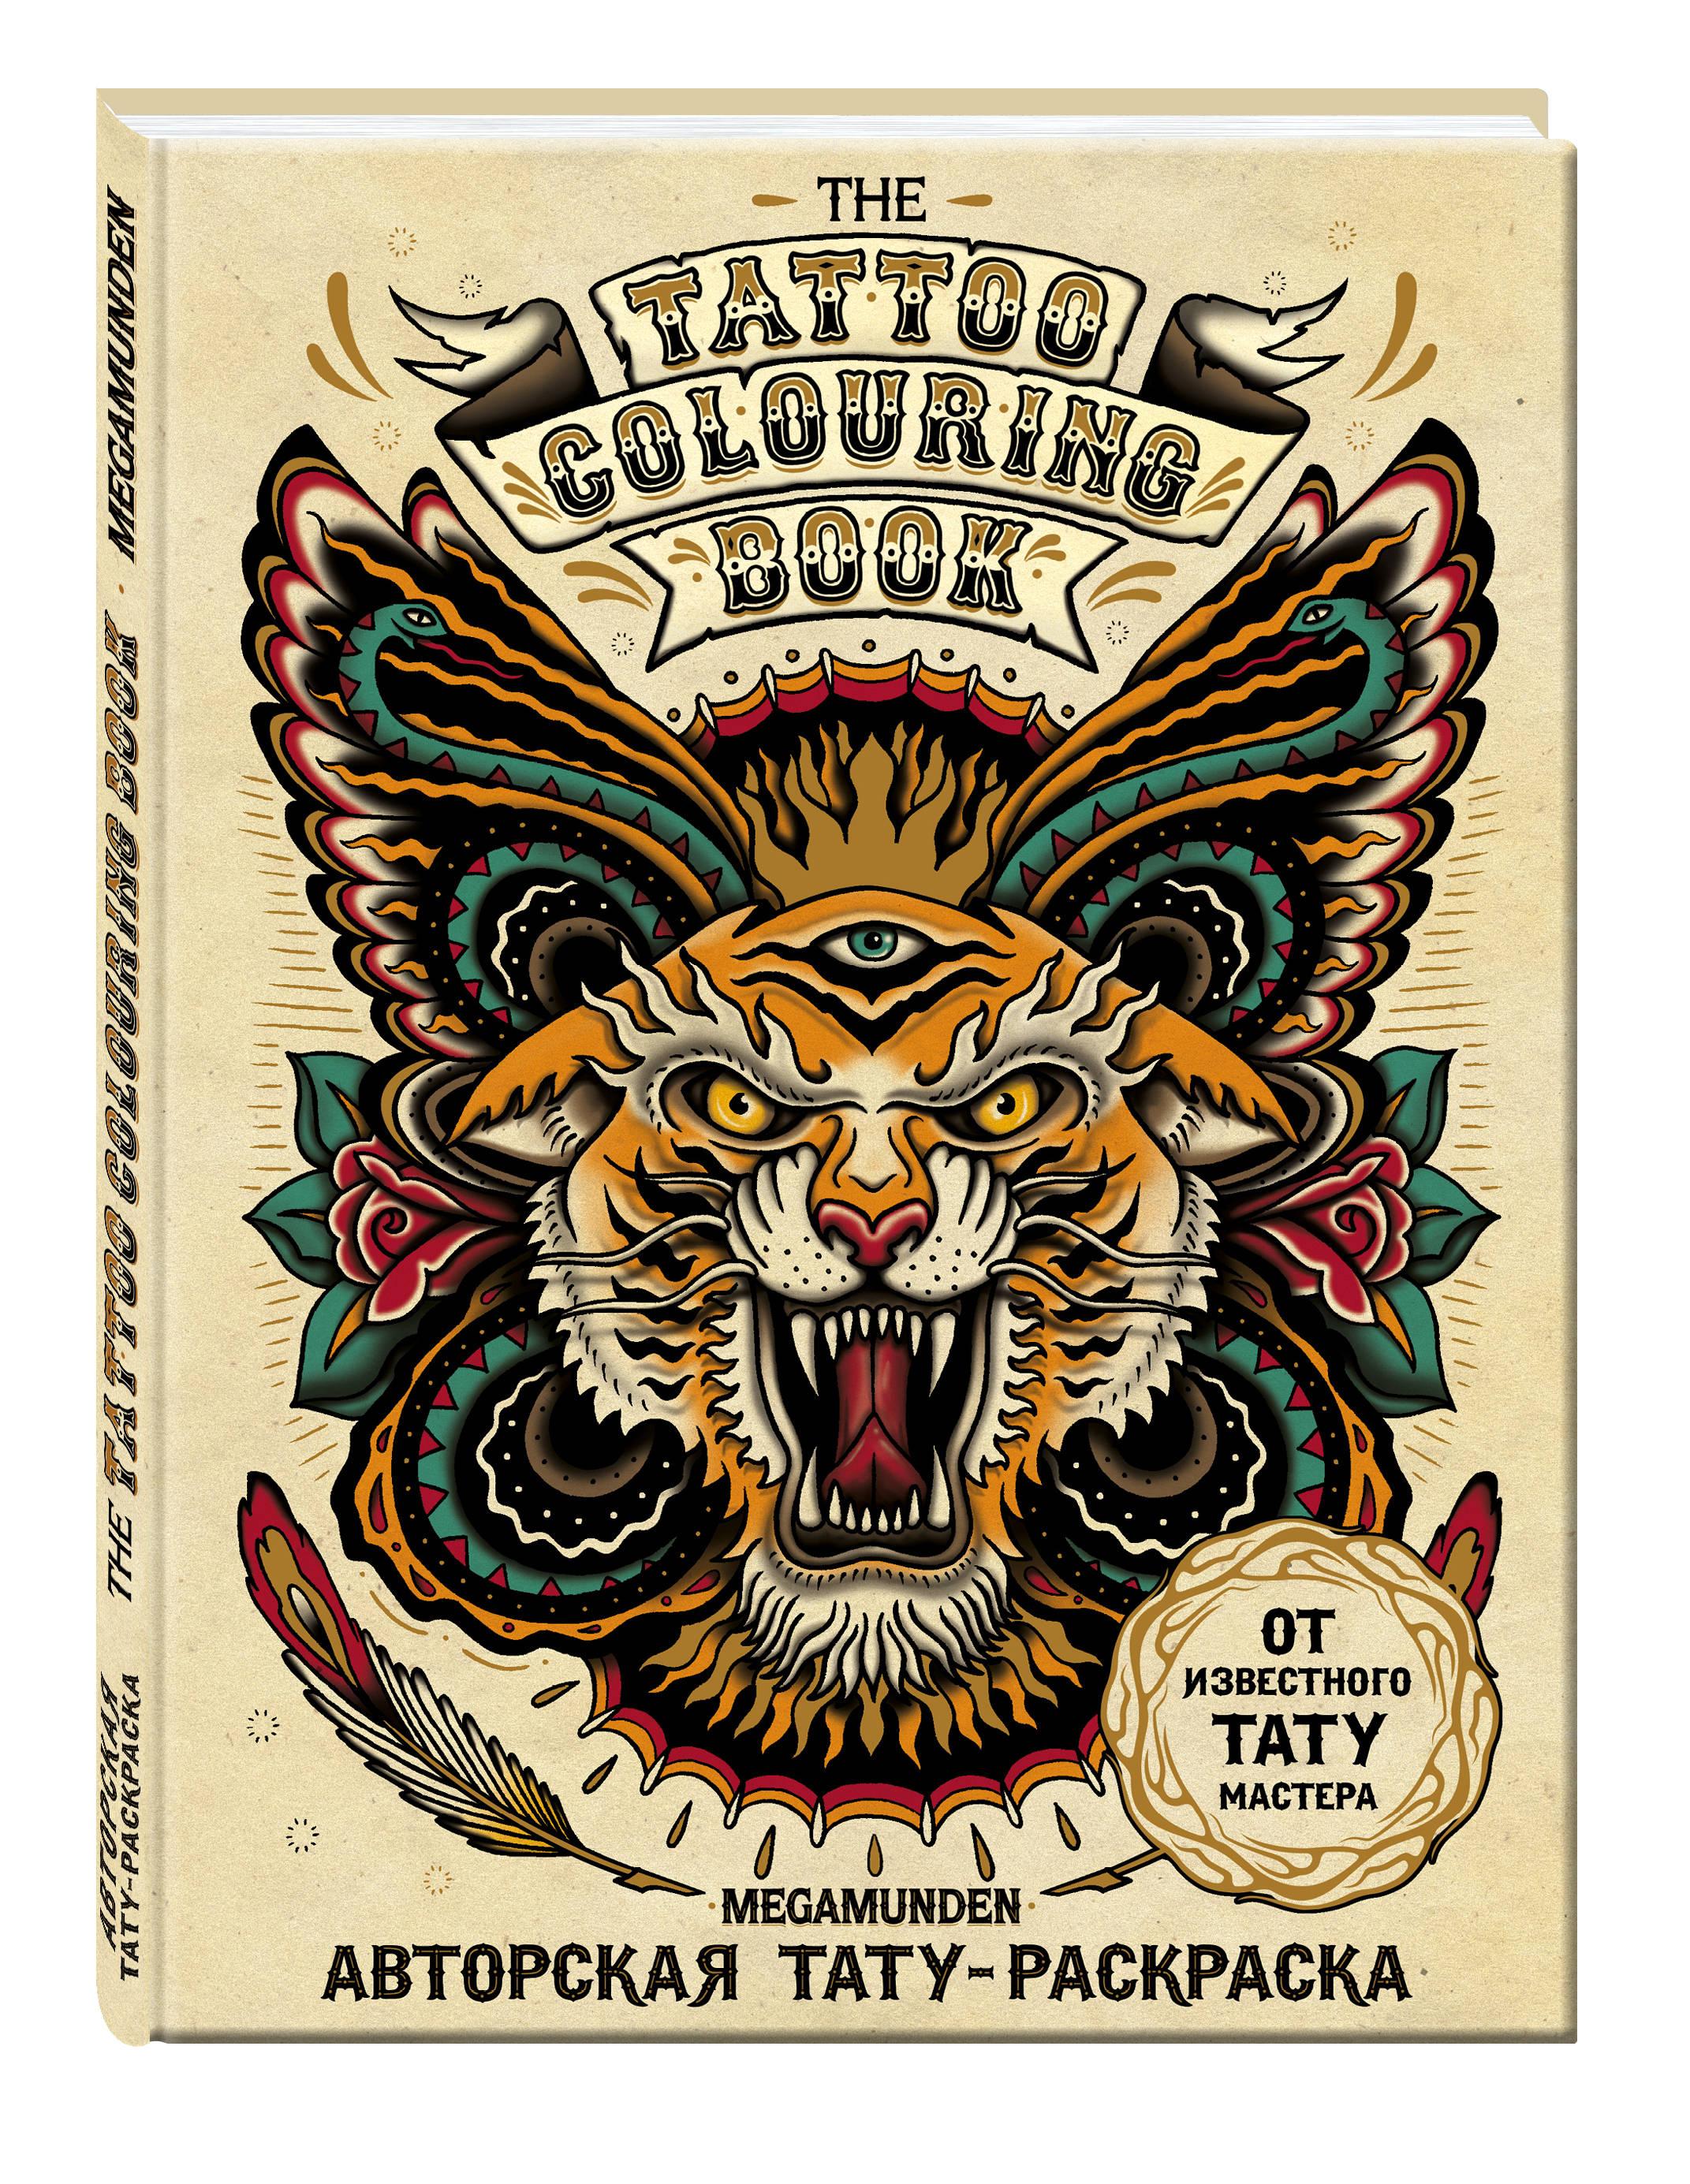 Авторская тату-раскраска. The Tattoo Colouring Book. Megamunden (Арт-хобби. Блокноты и раскраски) авторская тату раскраска the tattoo colouring book megamunden арт хобби блокноты и раскраски